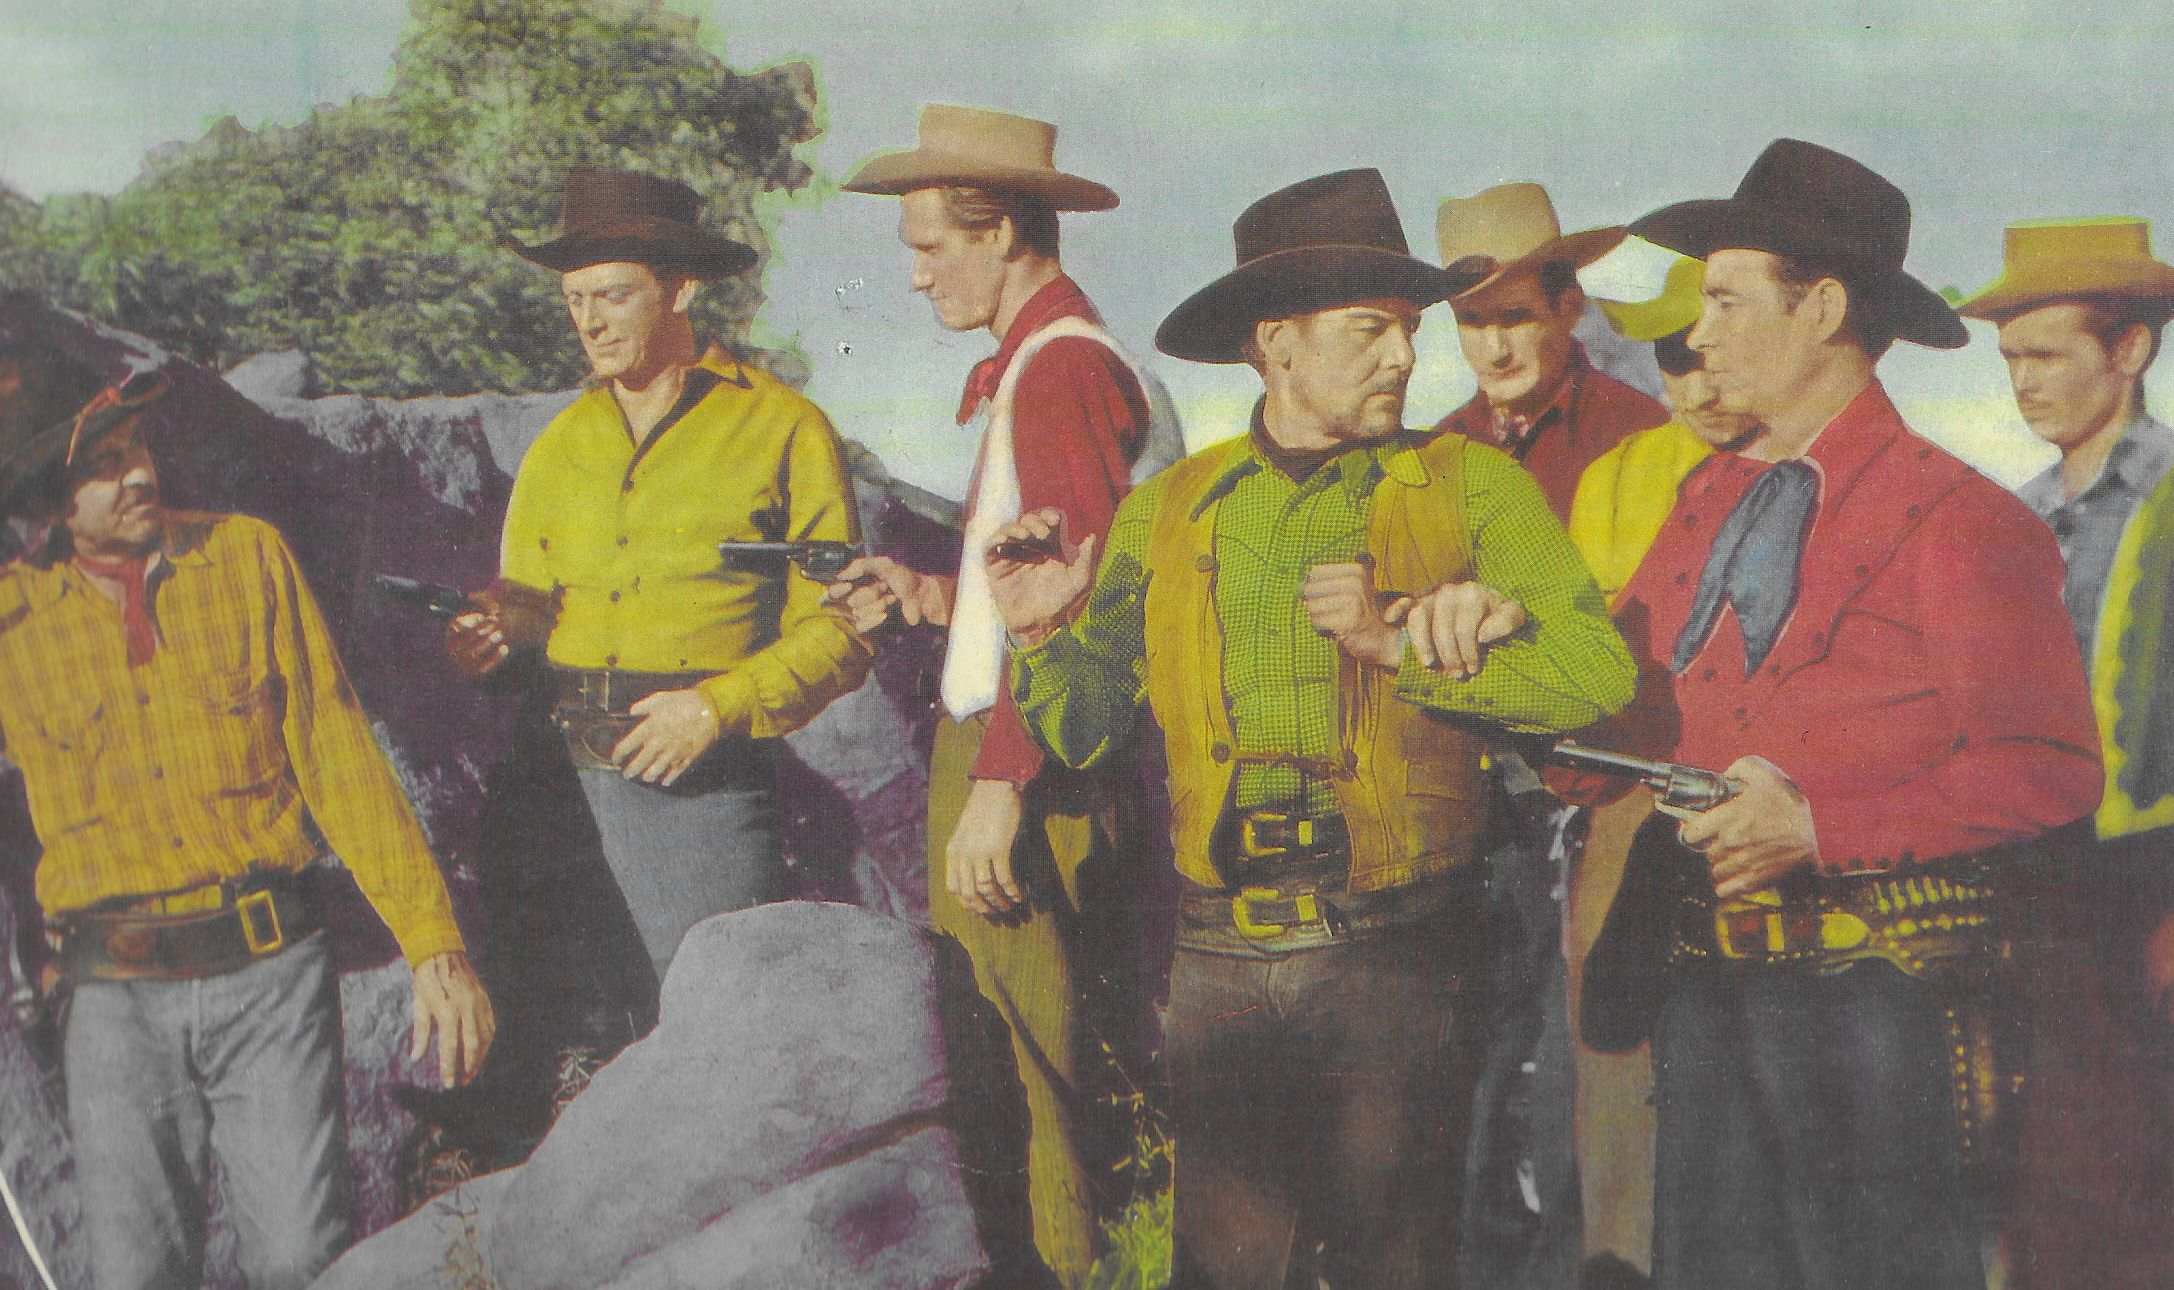 Freddie Daniel, Eddie Dean, Bob Duncan, J.D. Sumner, Eddie Wallace, and M.H. Richman in Range Beyond the Blue (1947)